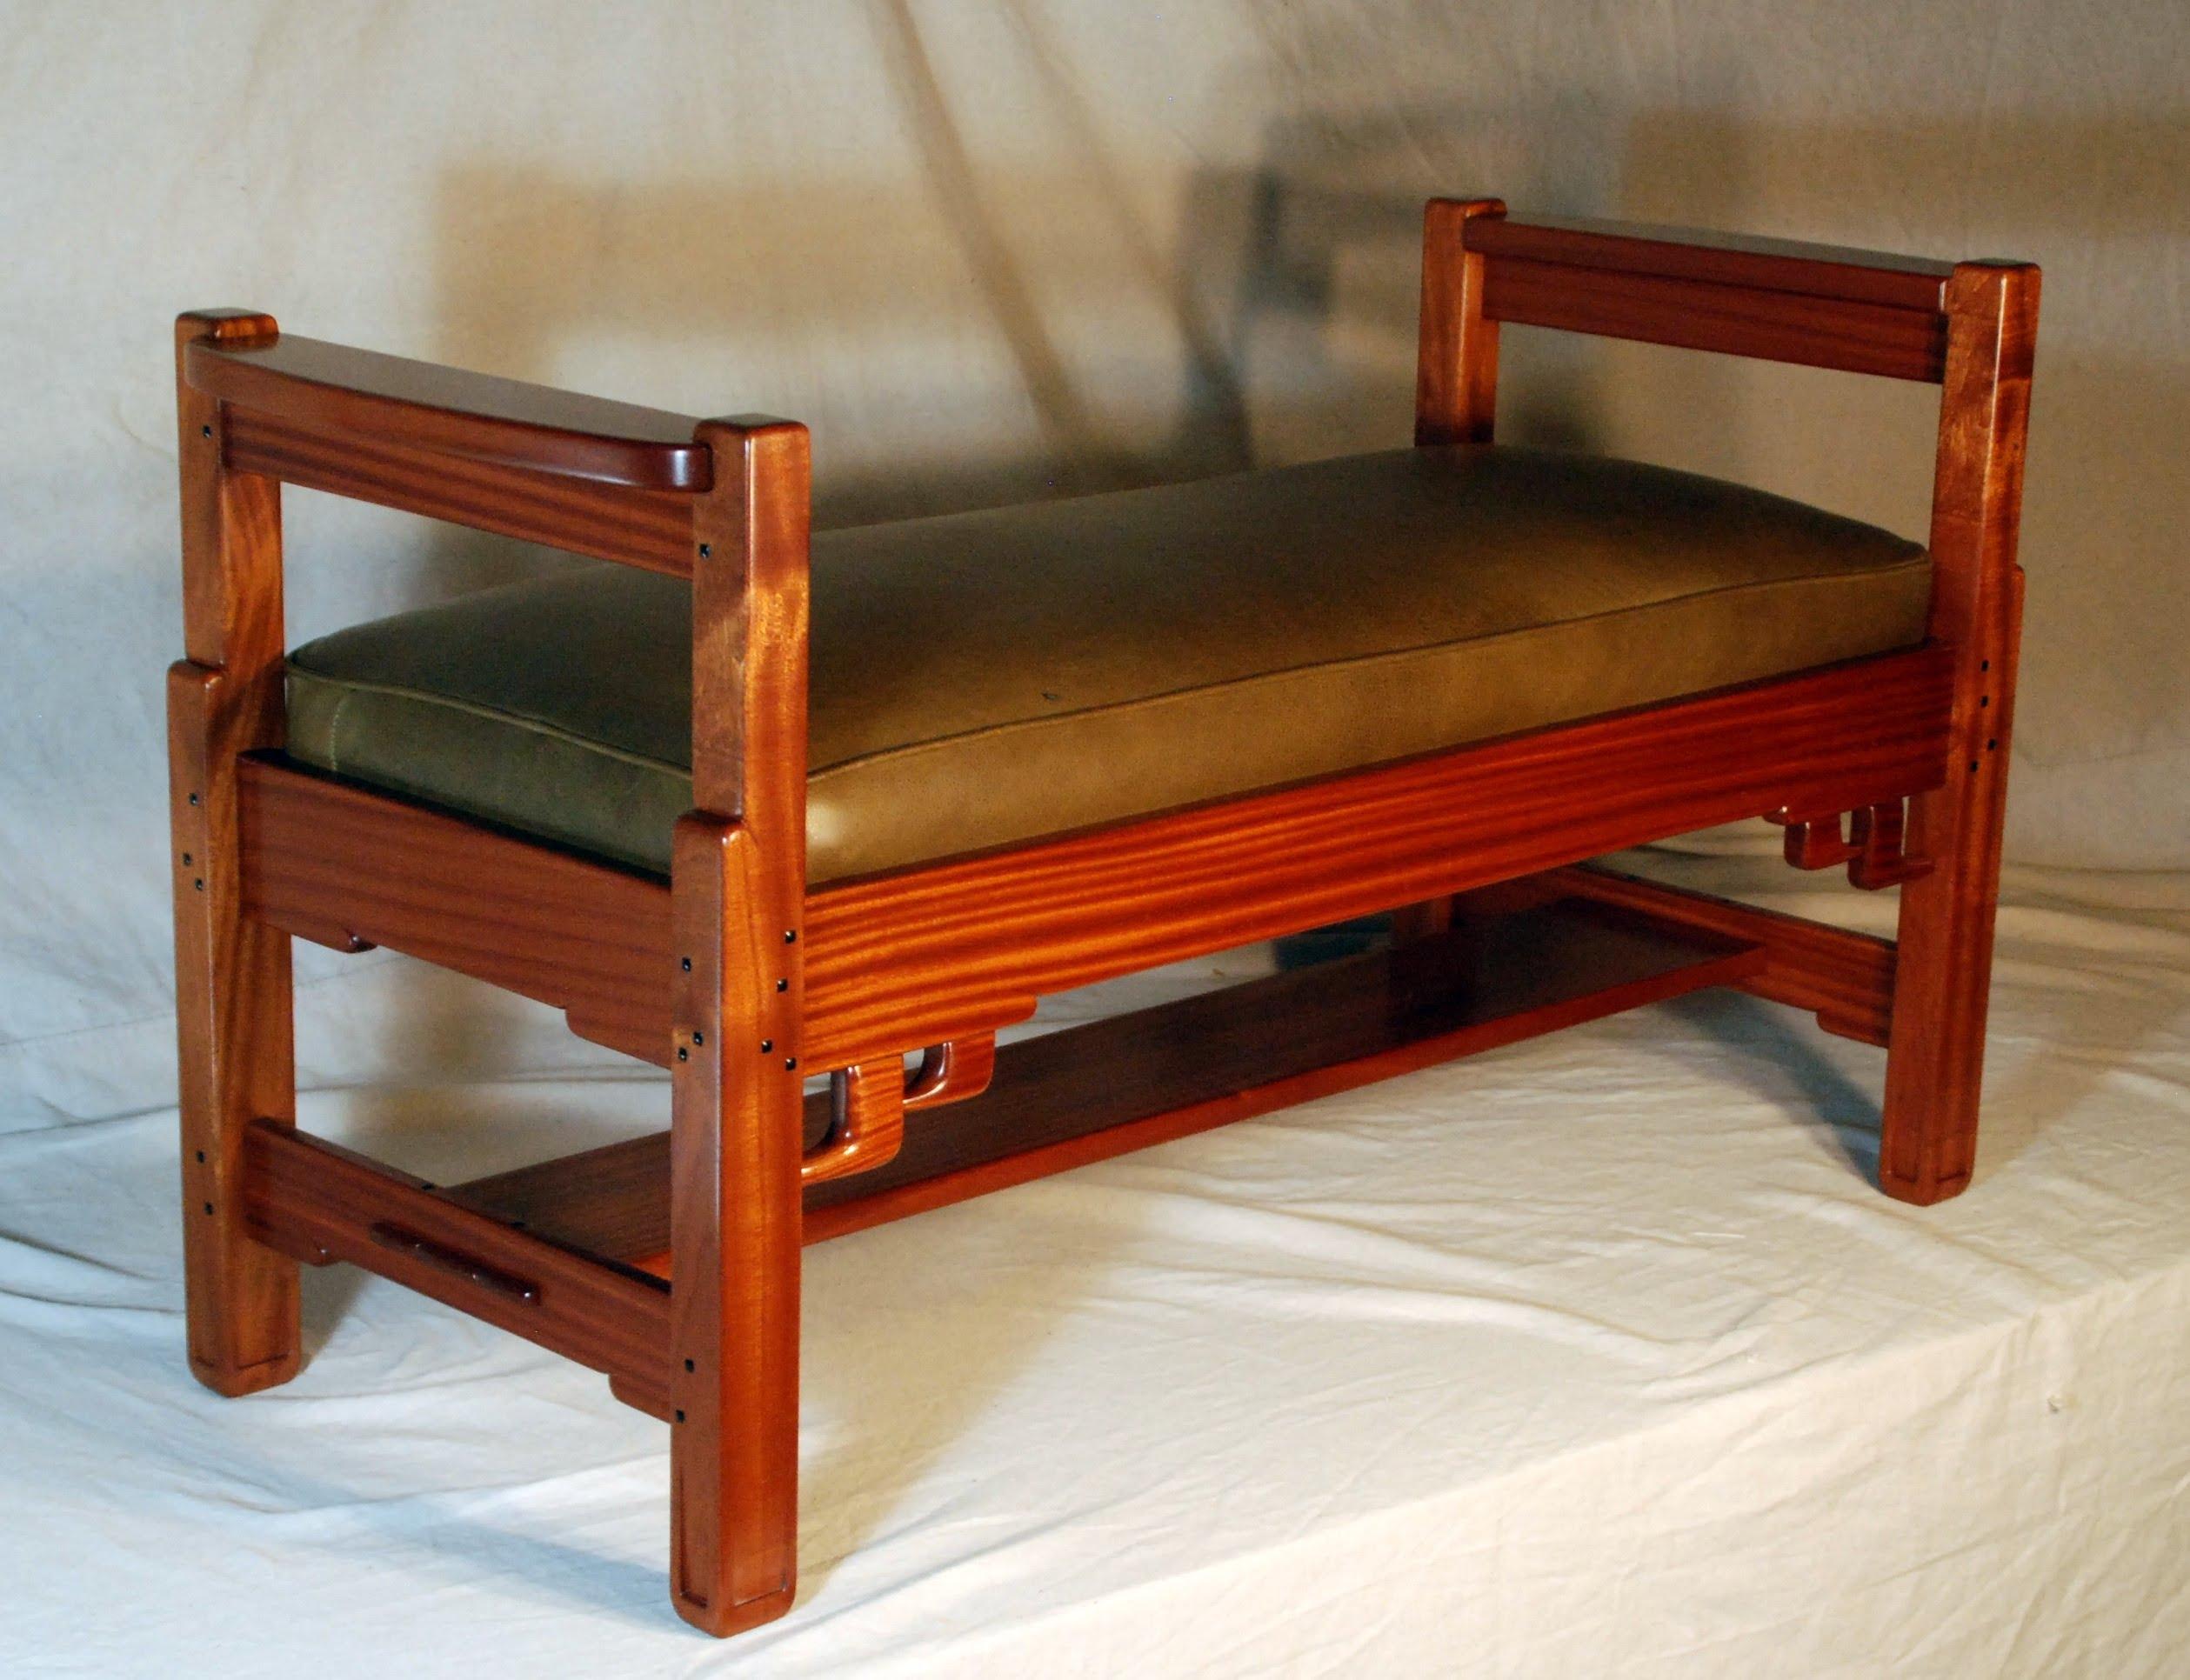 Voorhees Craftsman Mission Oak Furniture GREENE & GREENE STYLE